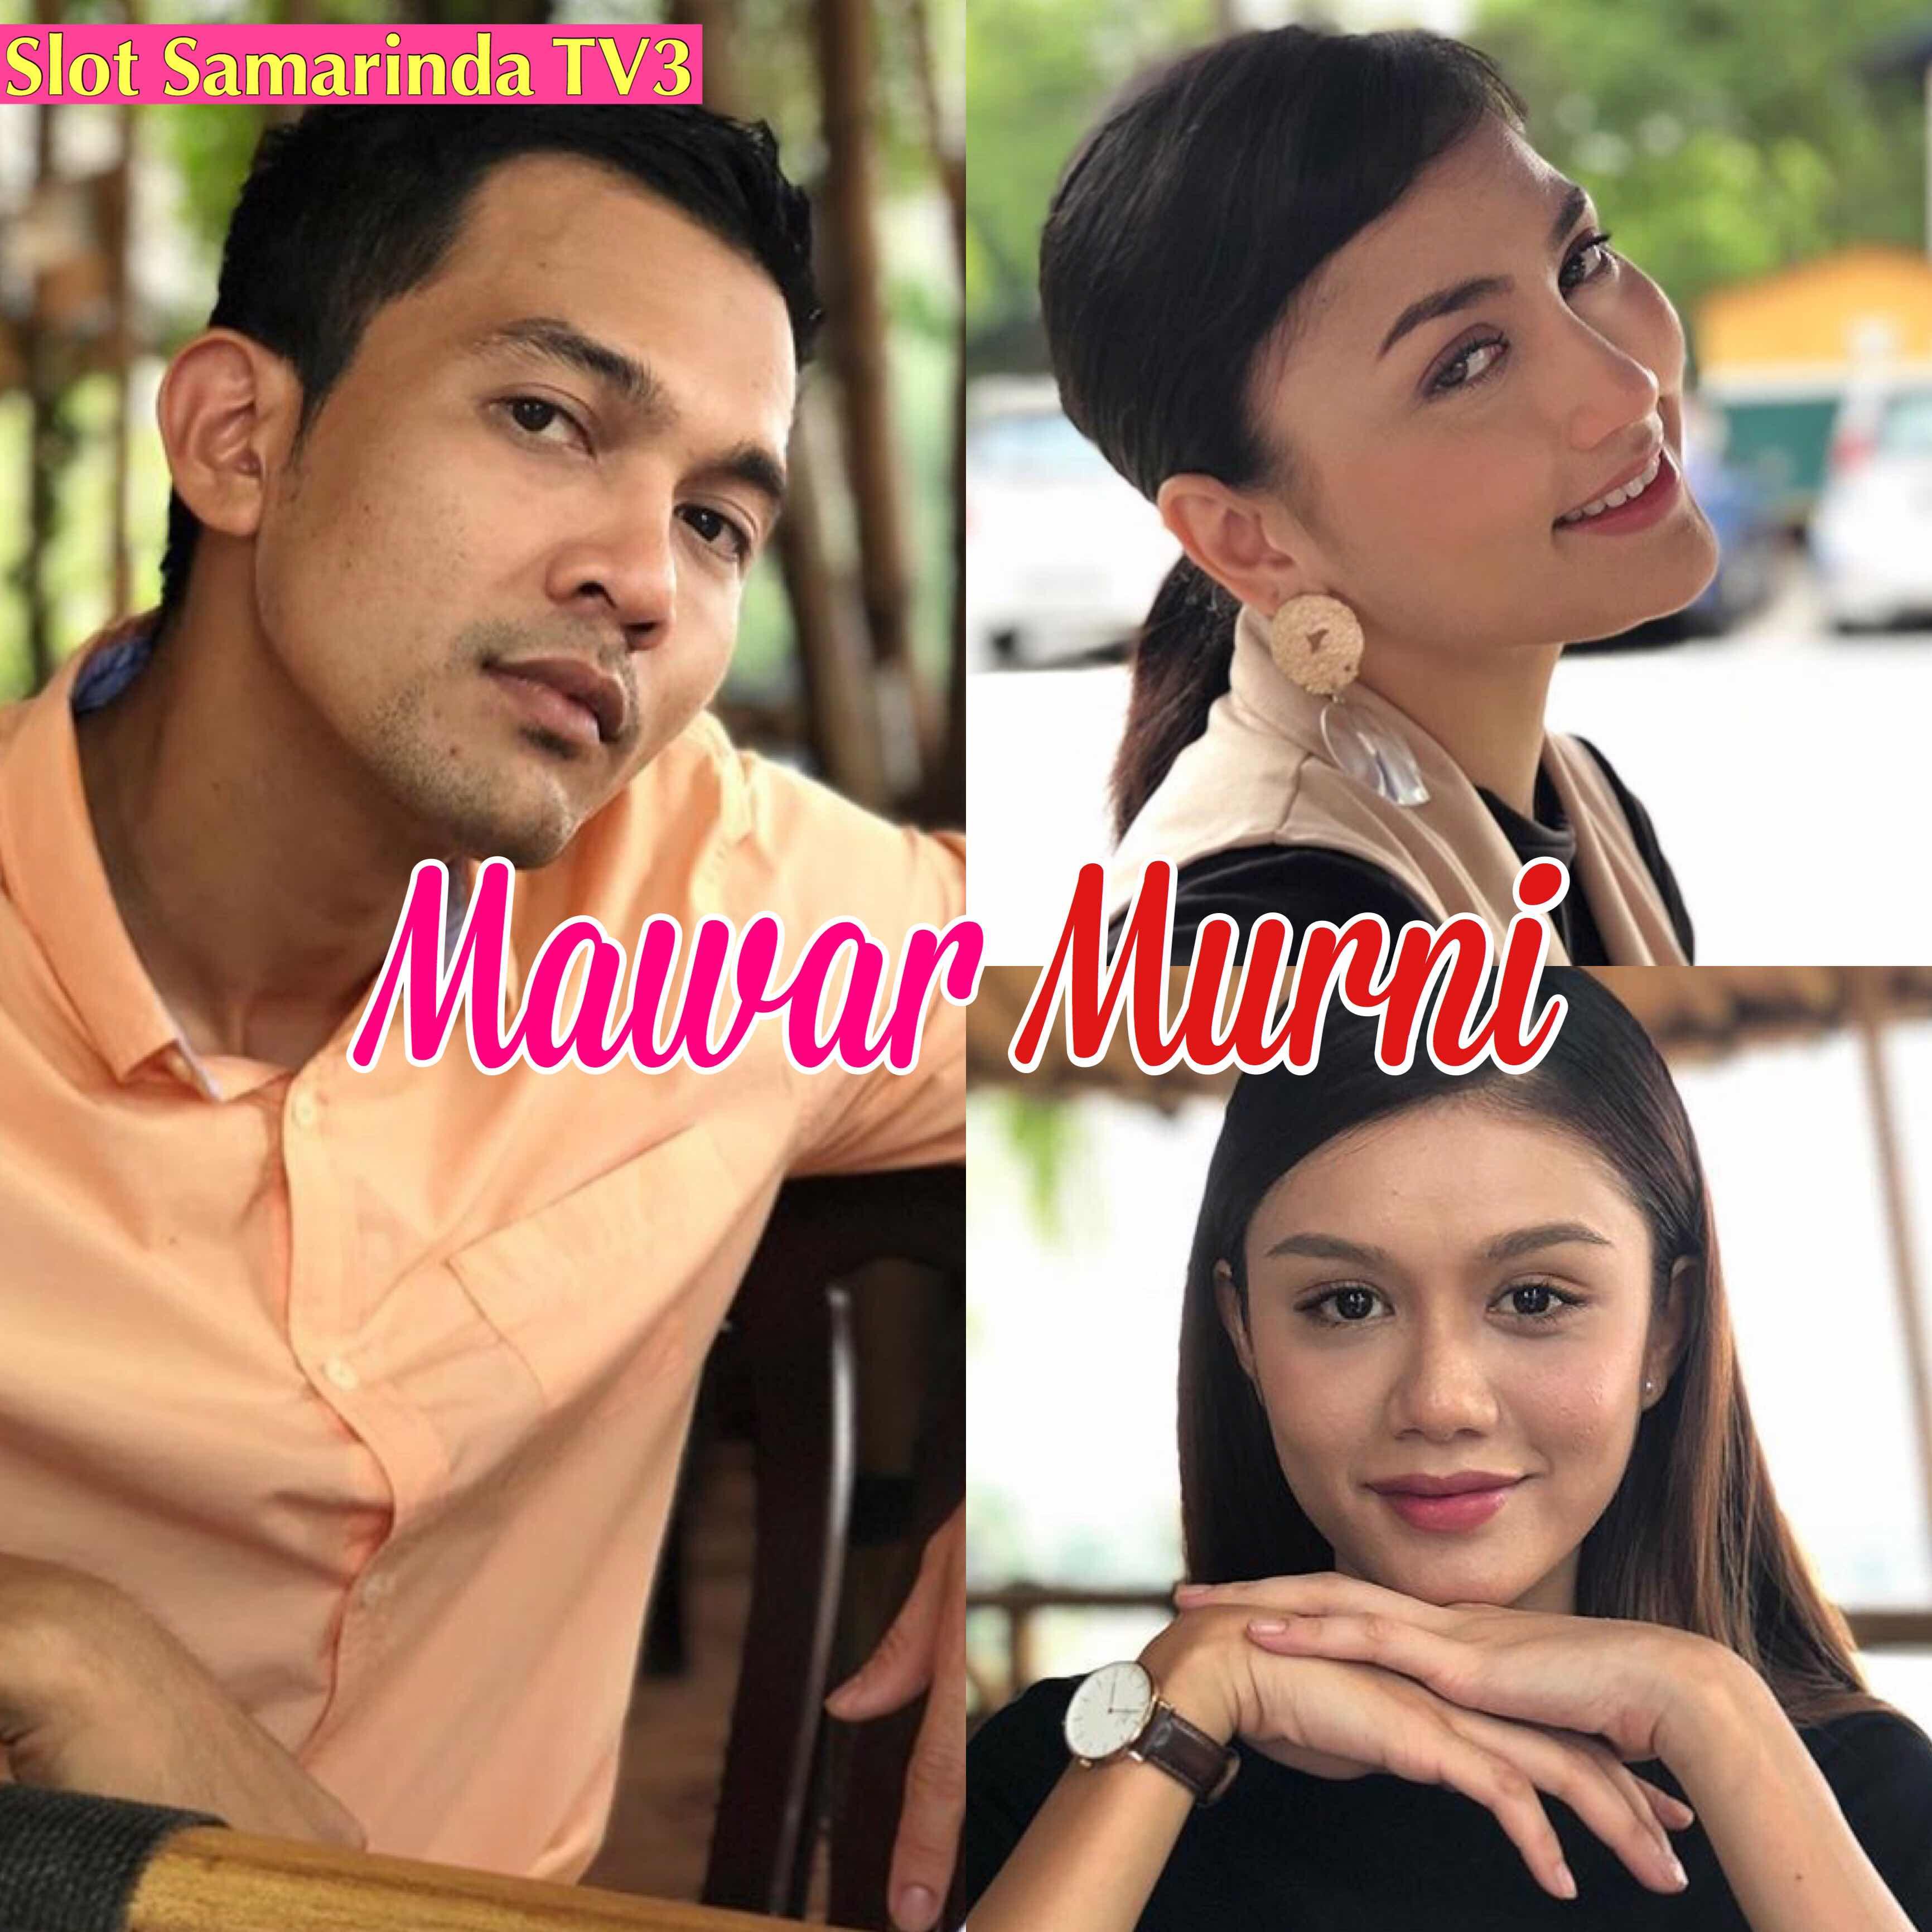 %255BUNSET%255D - Drama Mawar Murni akan datang di slot Samarinda TV3